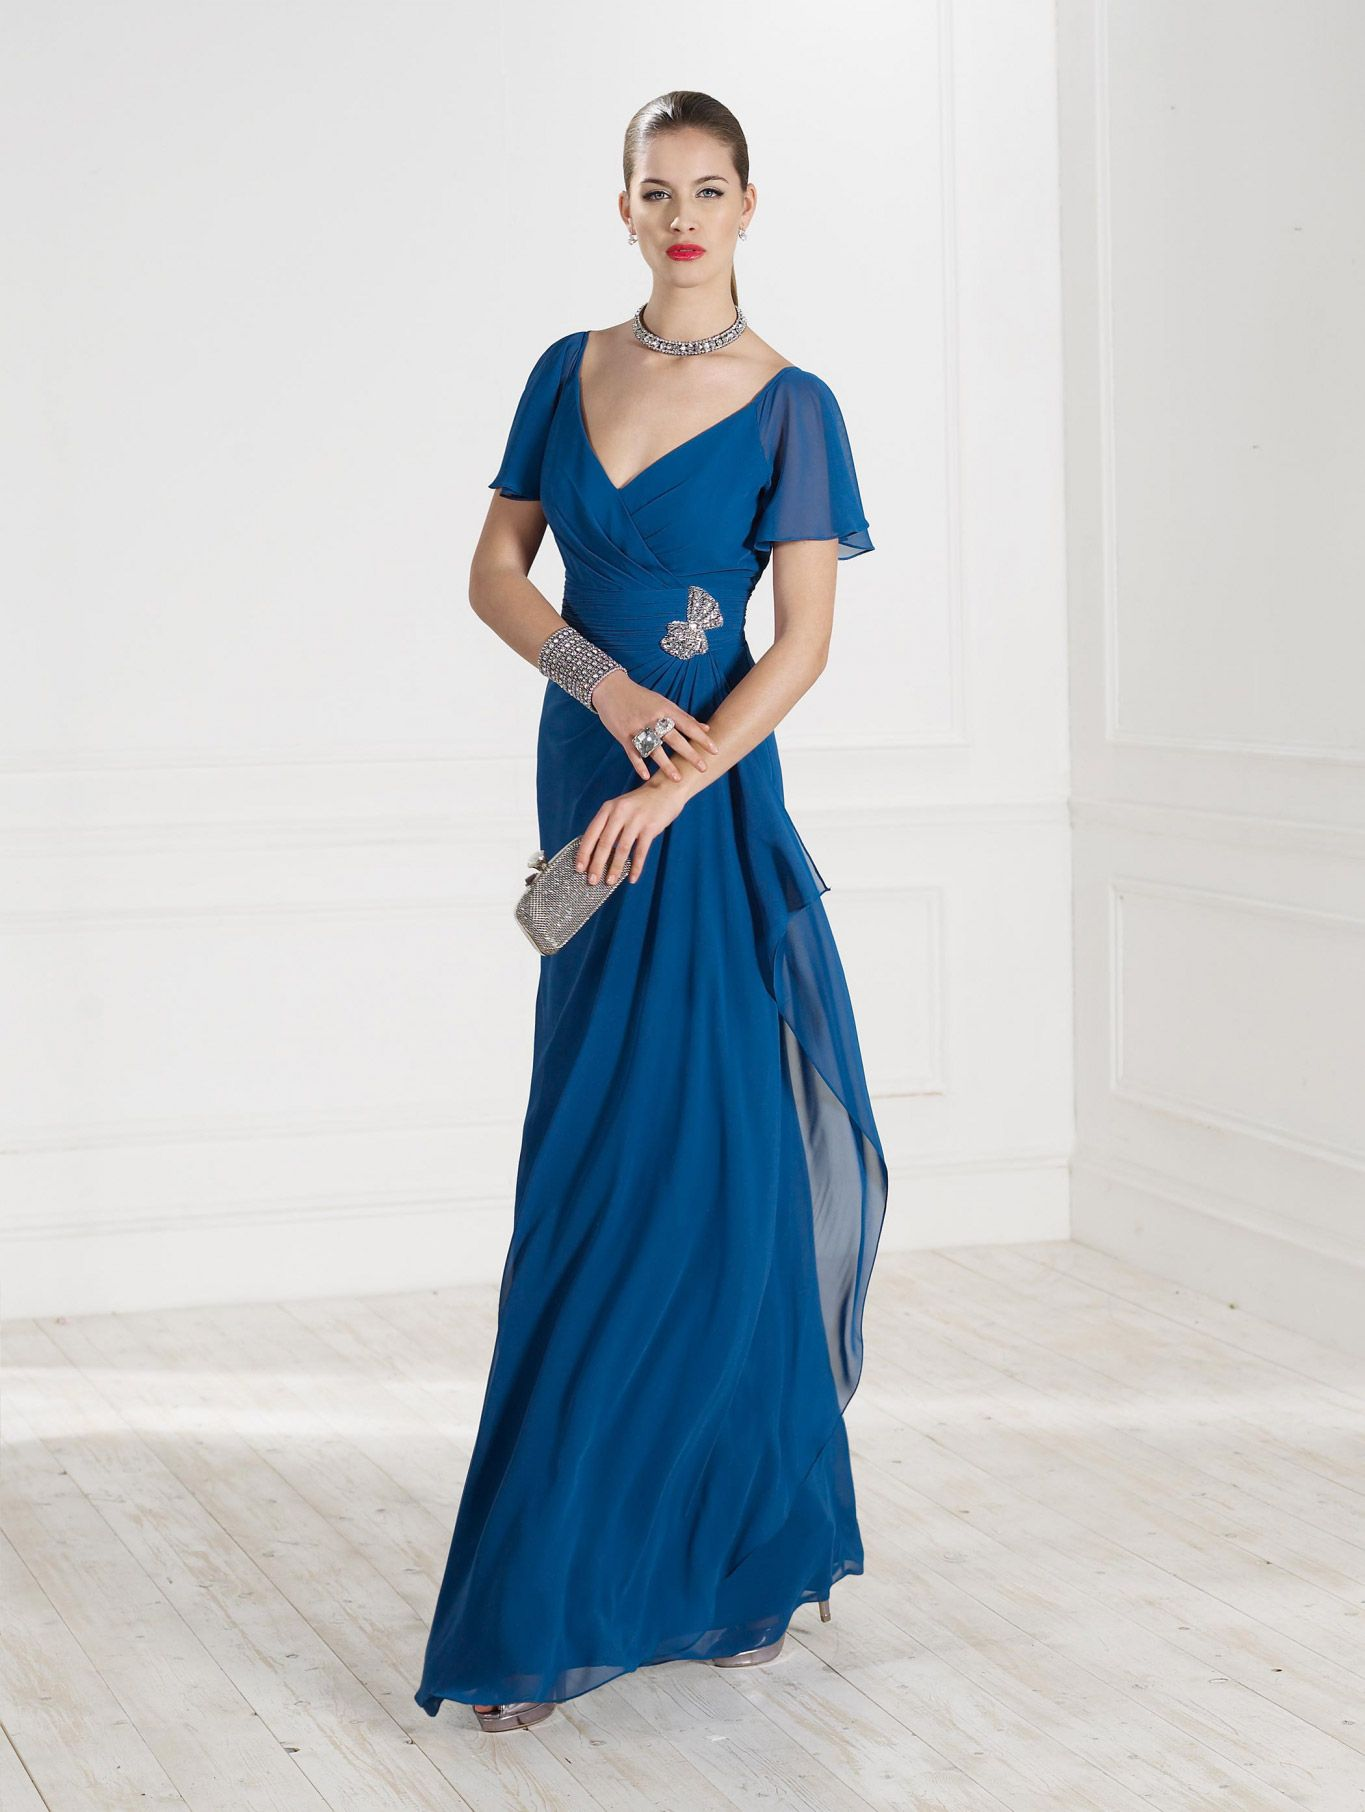 d9f85015bc1b My Wedding Tips: Το φόρεμα της μαμάς της νύφης (και του γαμπρού ...